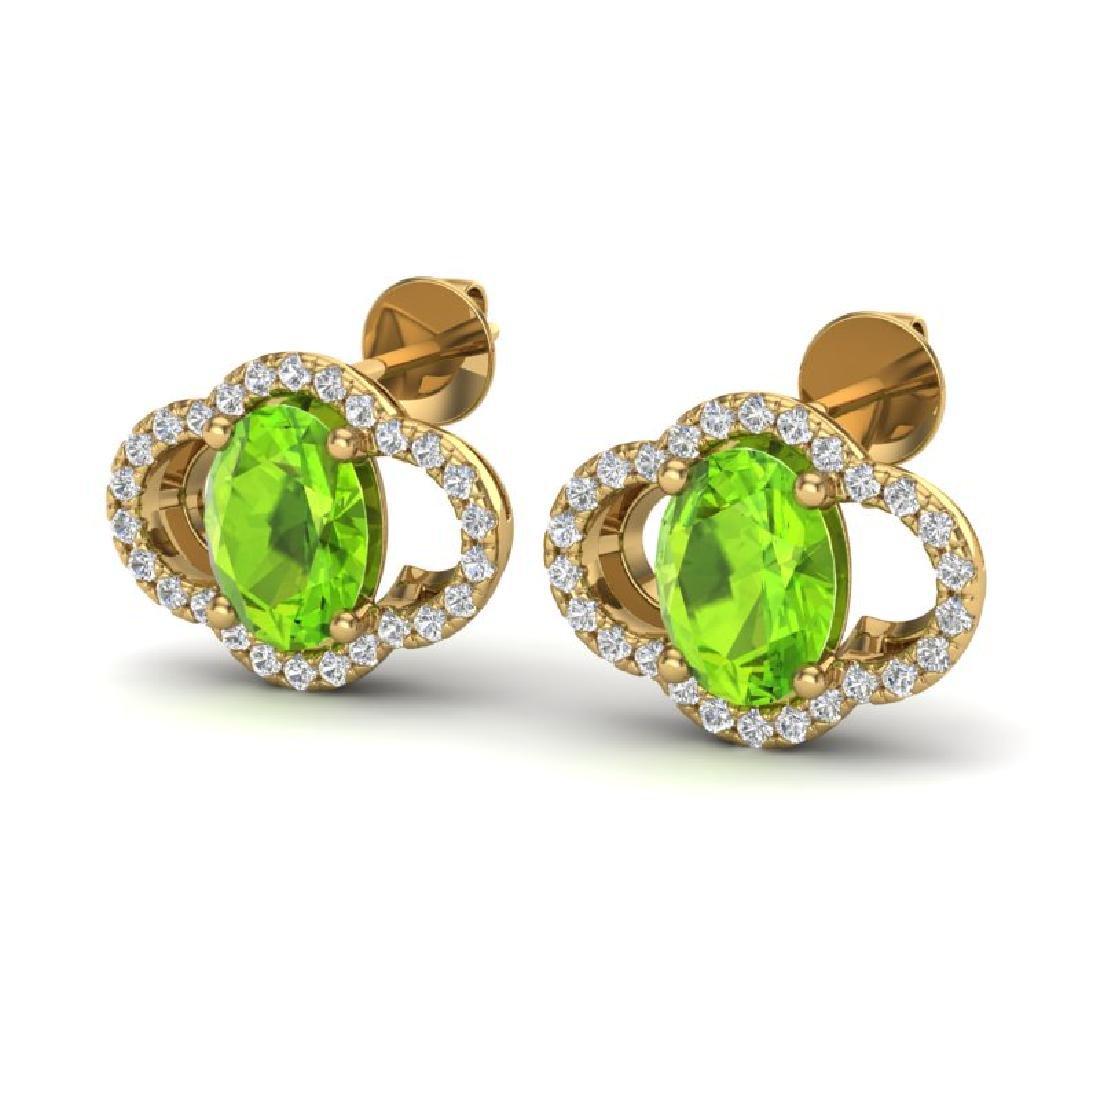 3.50 CTW Peridot & Micro Pave VS/SI Diamond Earrings